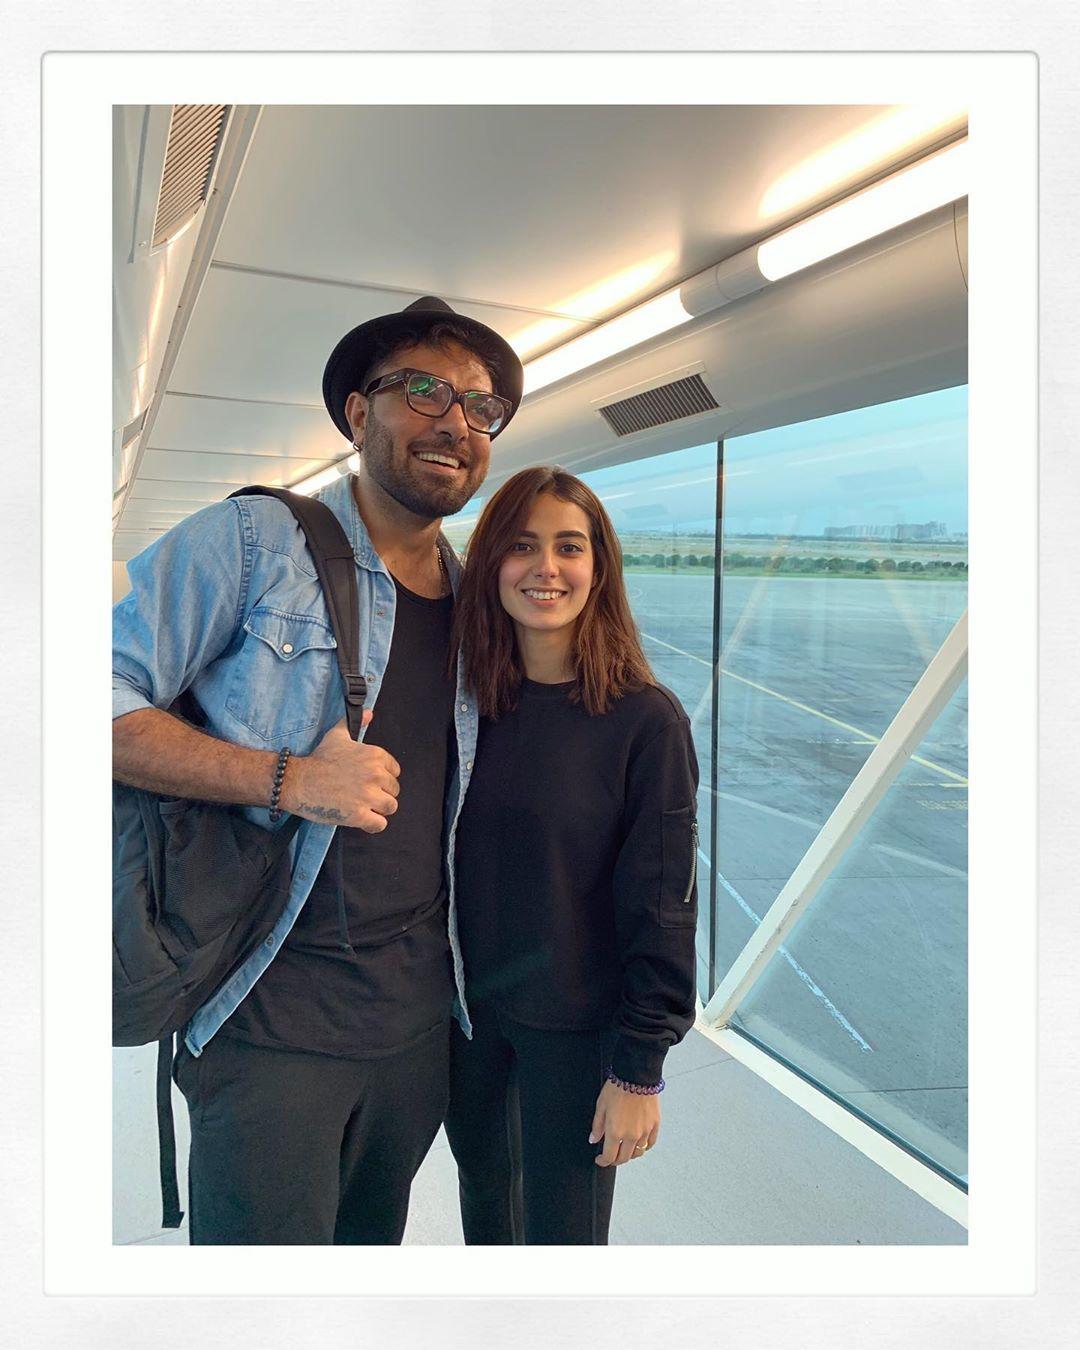 Awesome Clicks of Iqra Aziz and Yasir Hussain at Disney Land USA